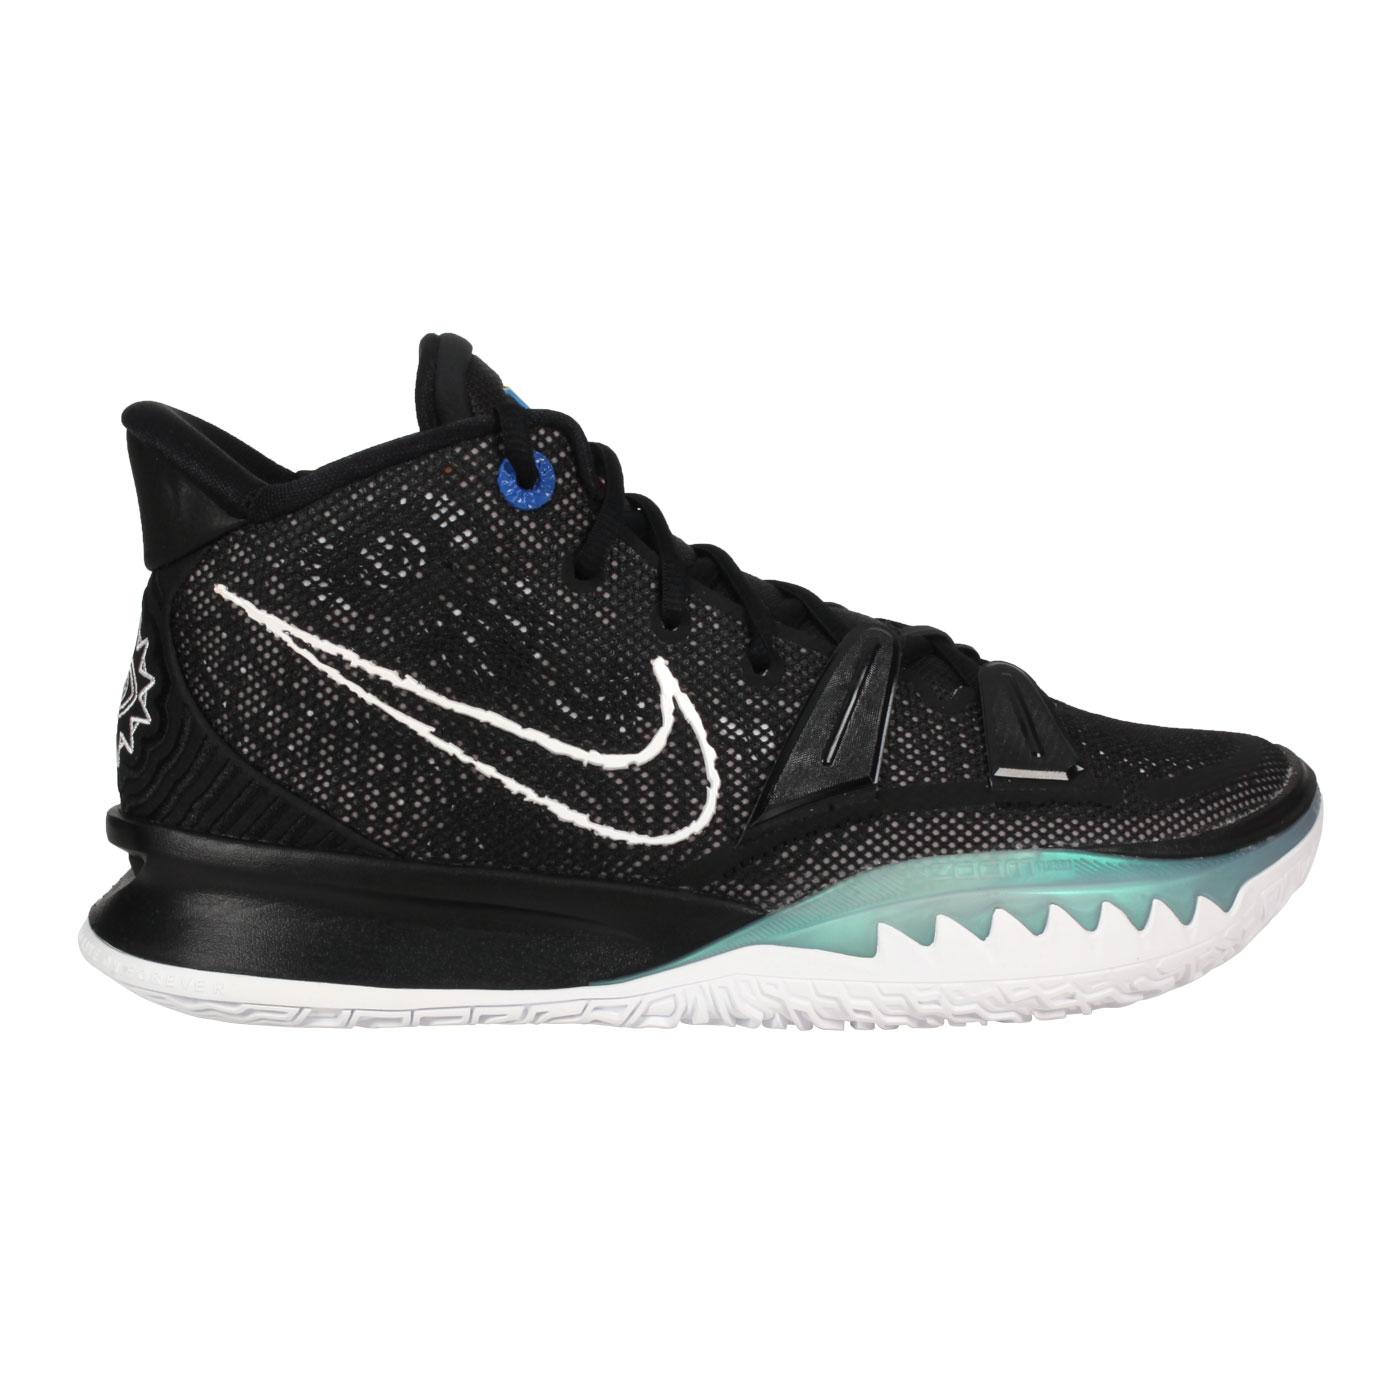 NIKE 男款籃球鞋  @KYRIE 7 EP@CQ9327002 - 黑白綠